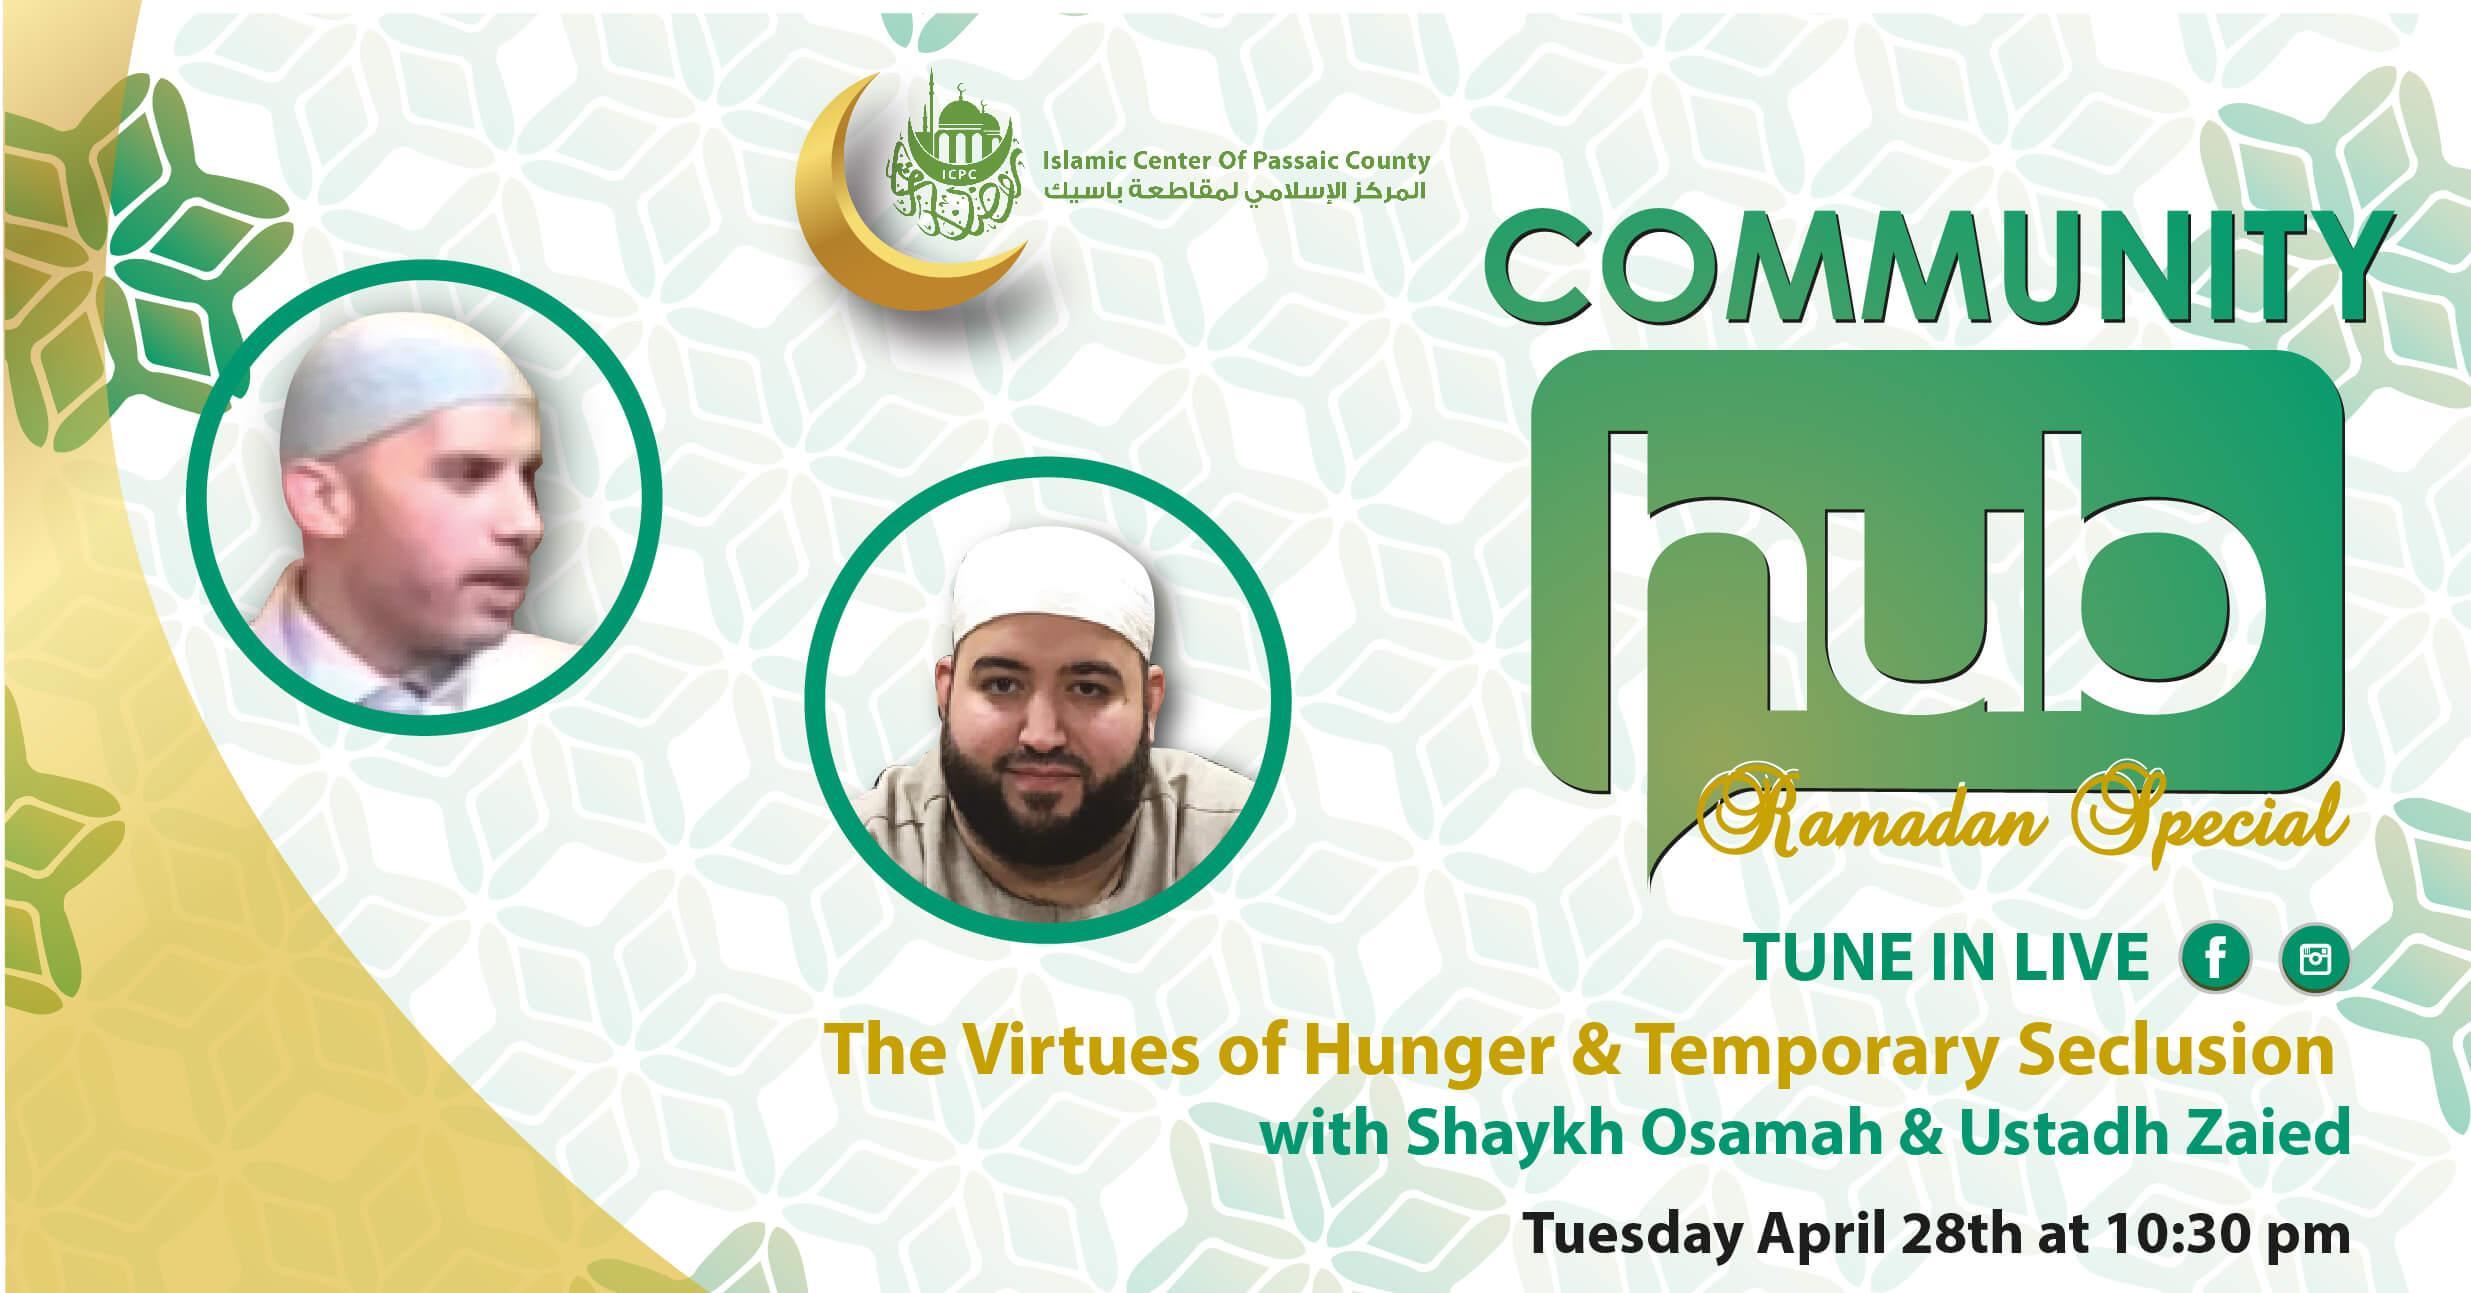 ramadan2020_4-28communityhub_socialmediabanners-02